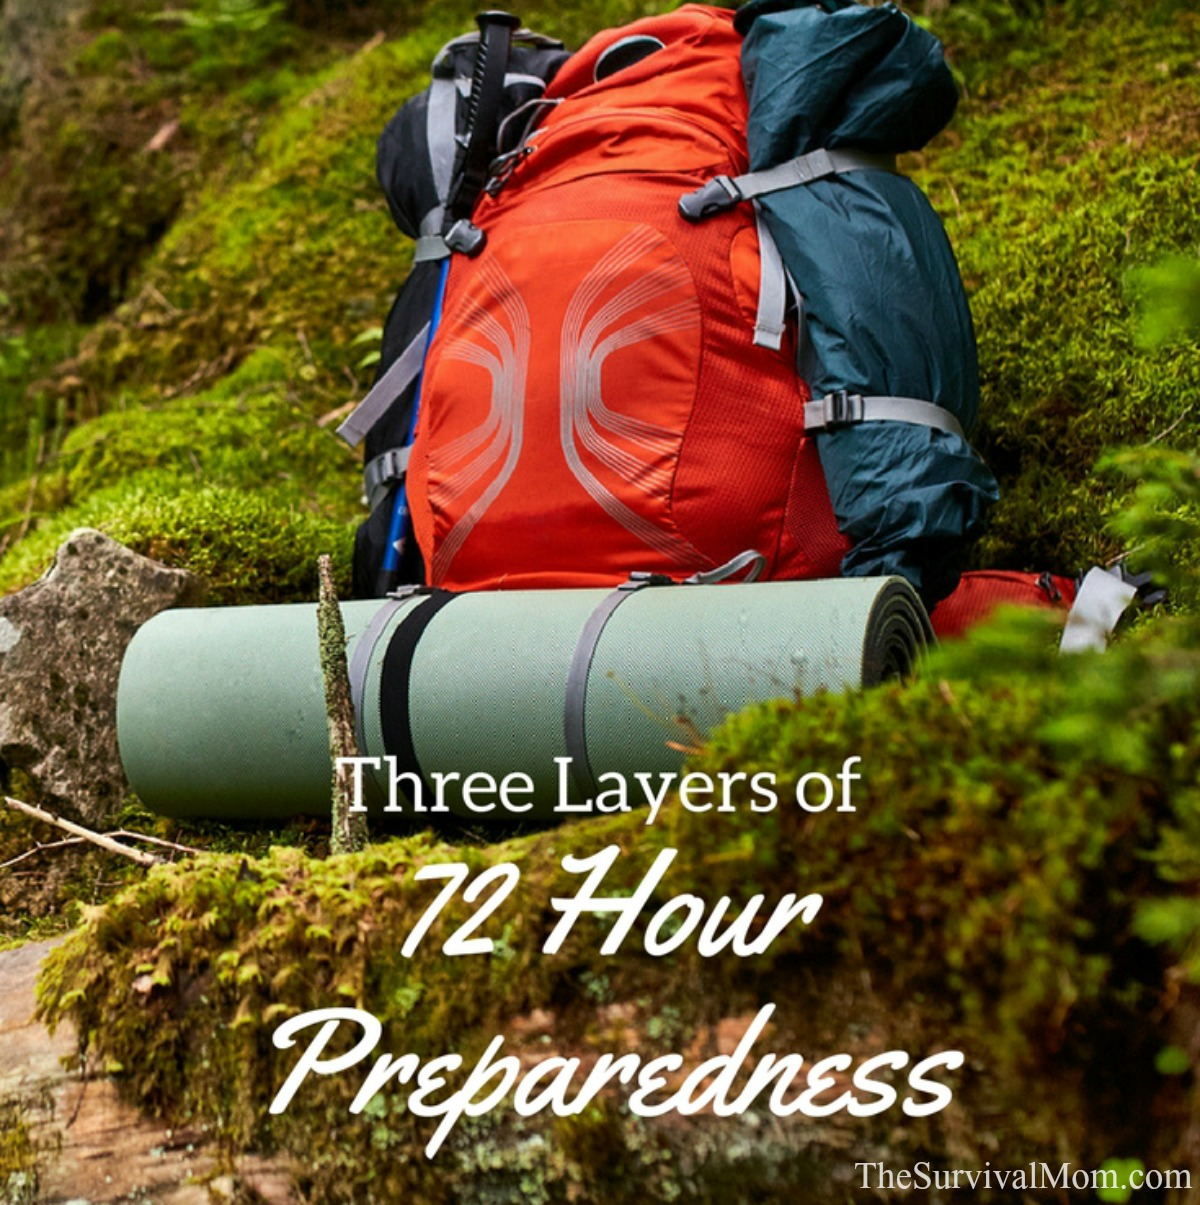 Three Layers of 72 Hour Preparedness via The Survival Mom